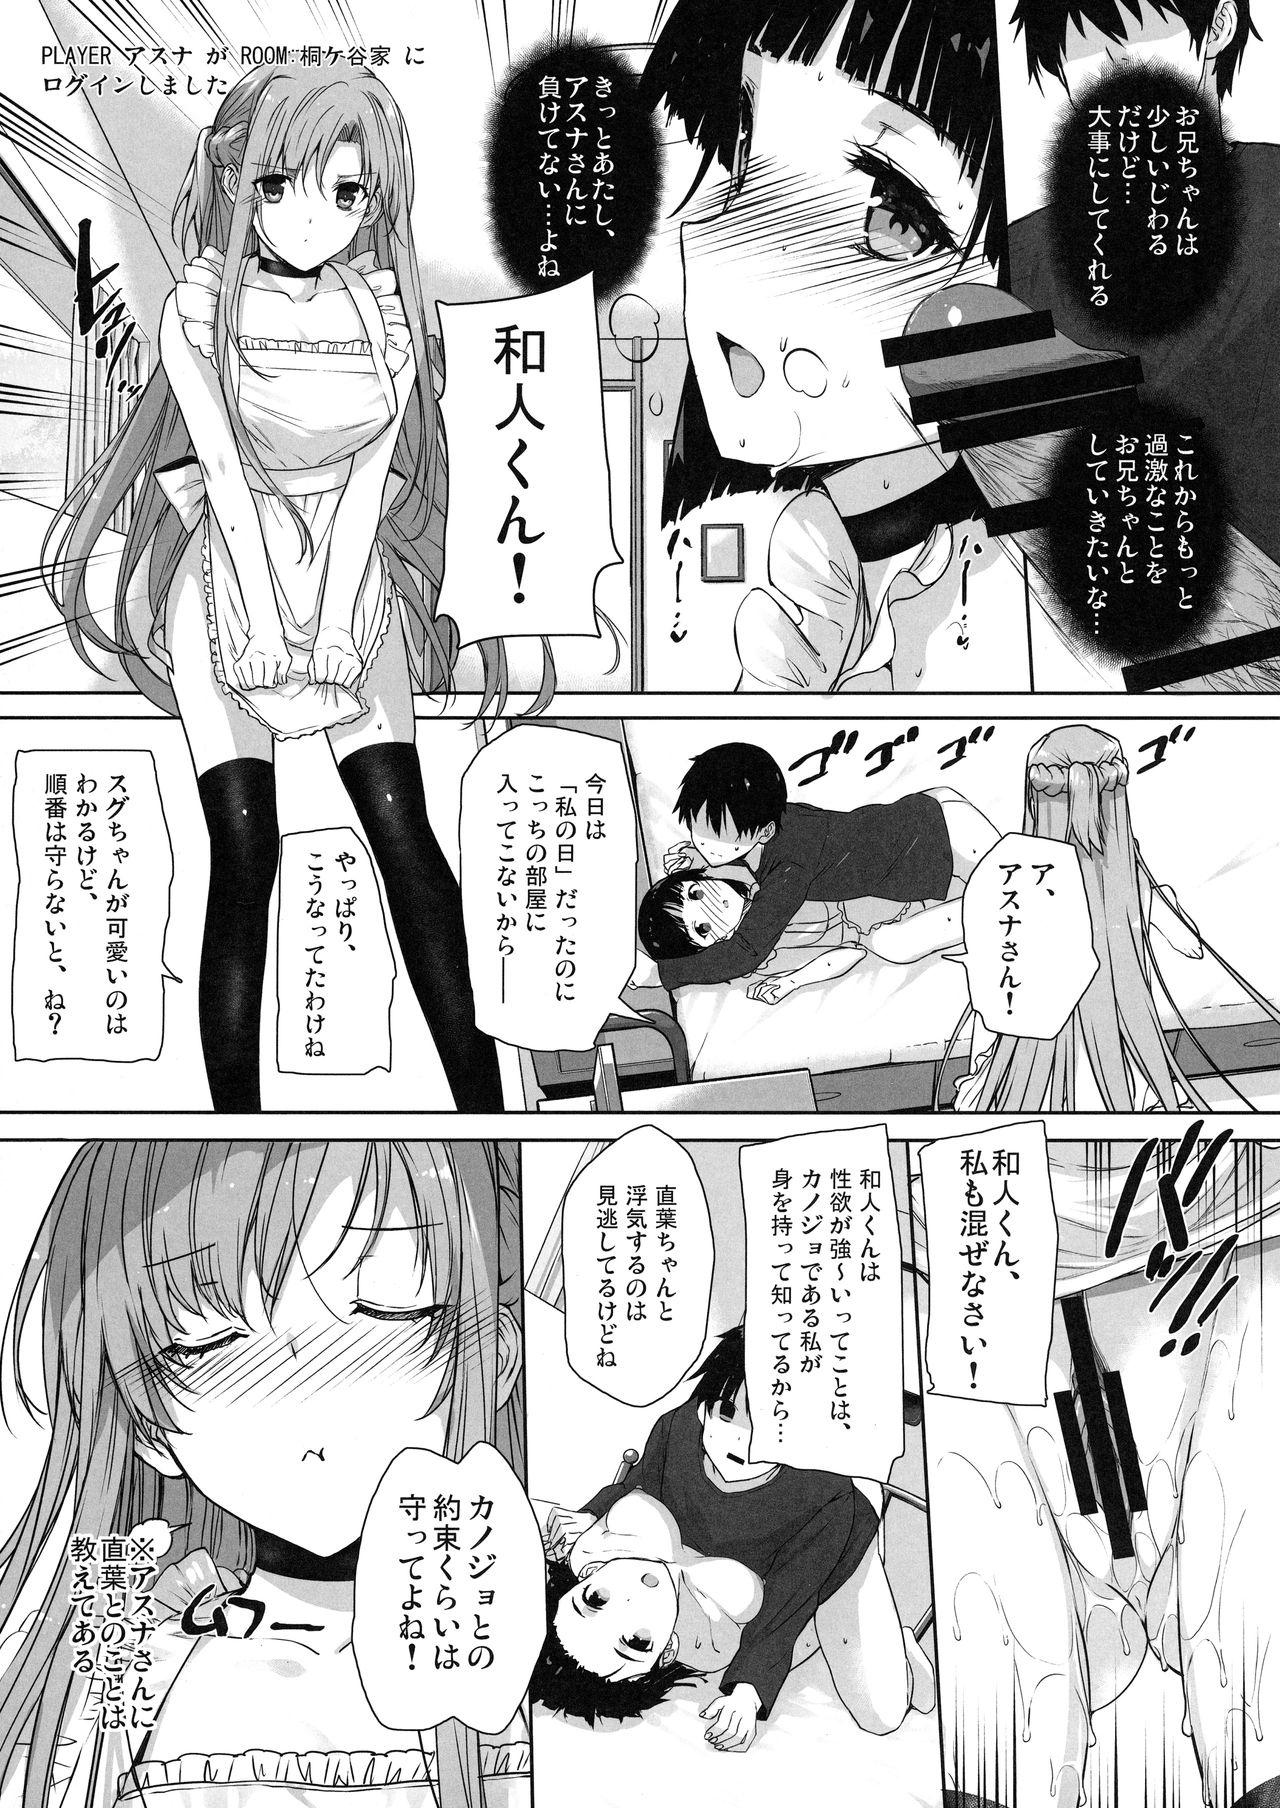 Basutei Shower Soushuuhen MANIA COLLECTION 02 63